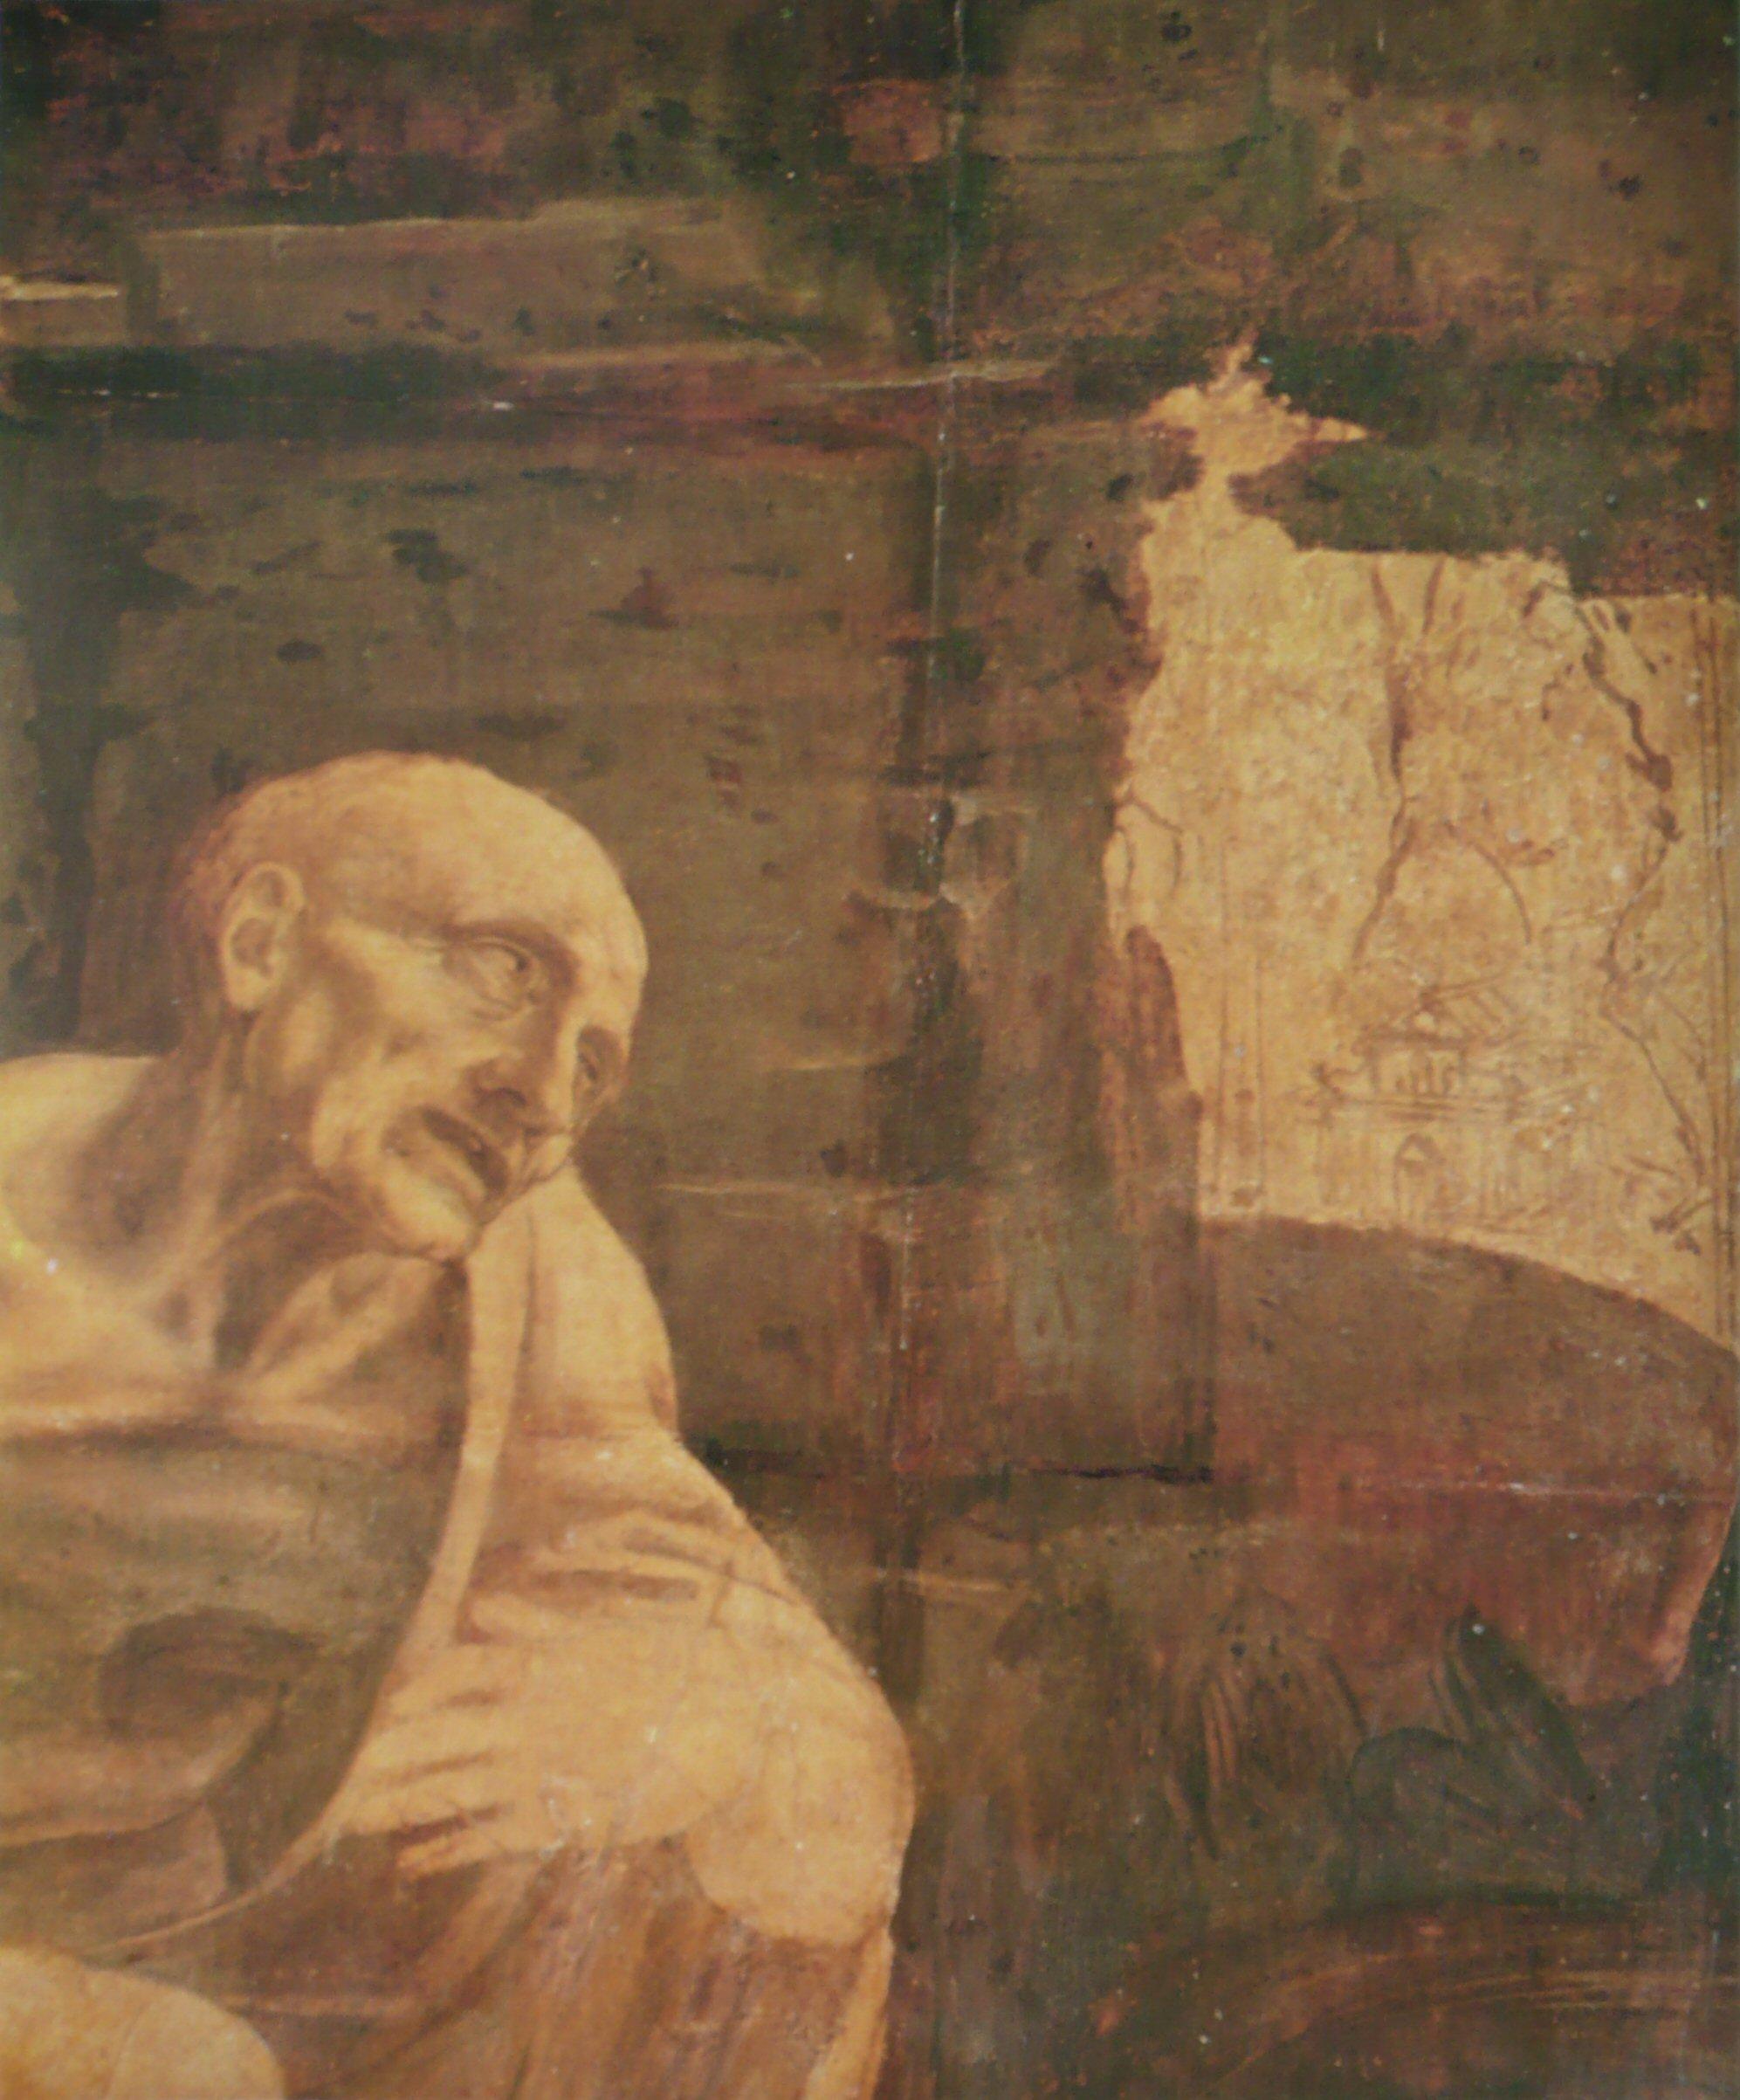 File:Léonard de Vinci - Saint Jérôme 1.jpg - Wikimedia Commons